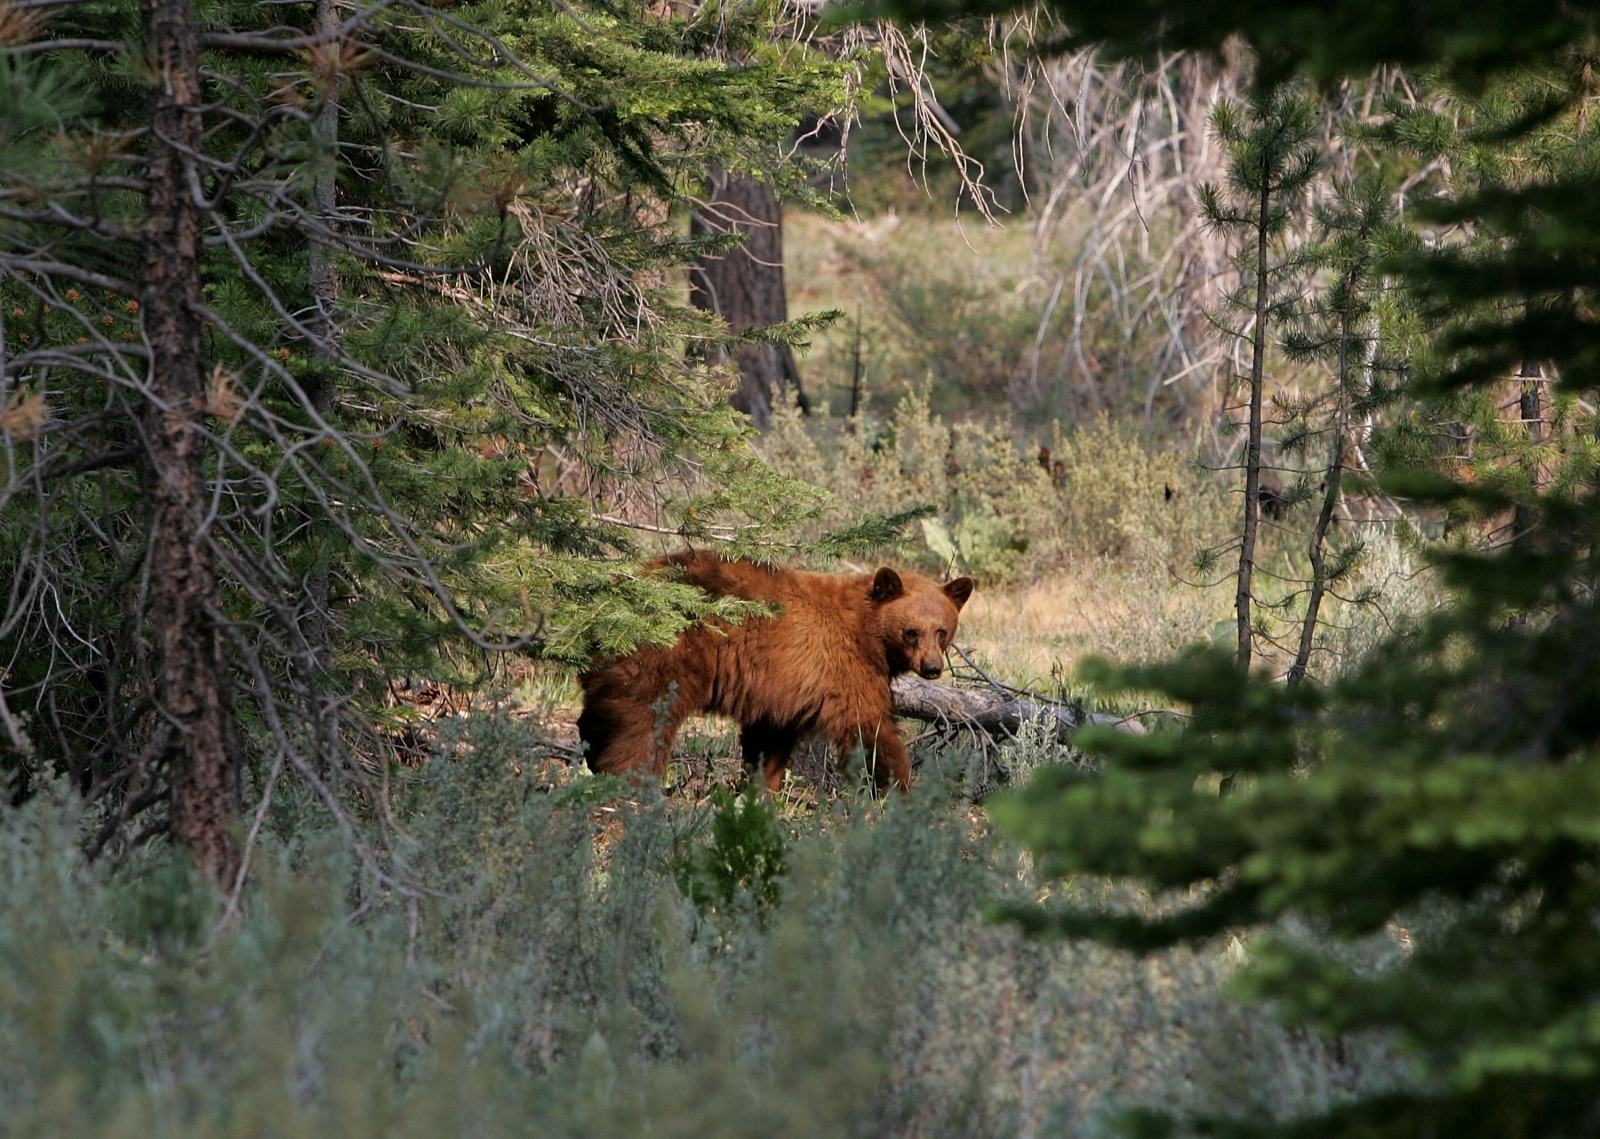 A bear near Lake Tahoe